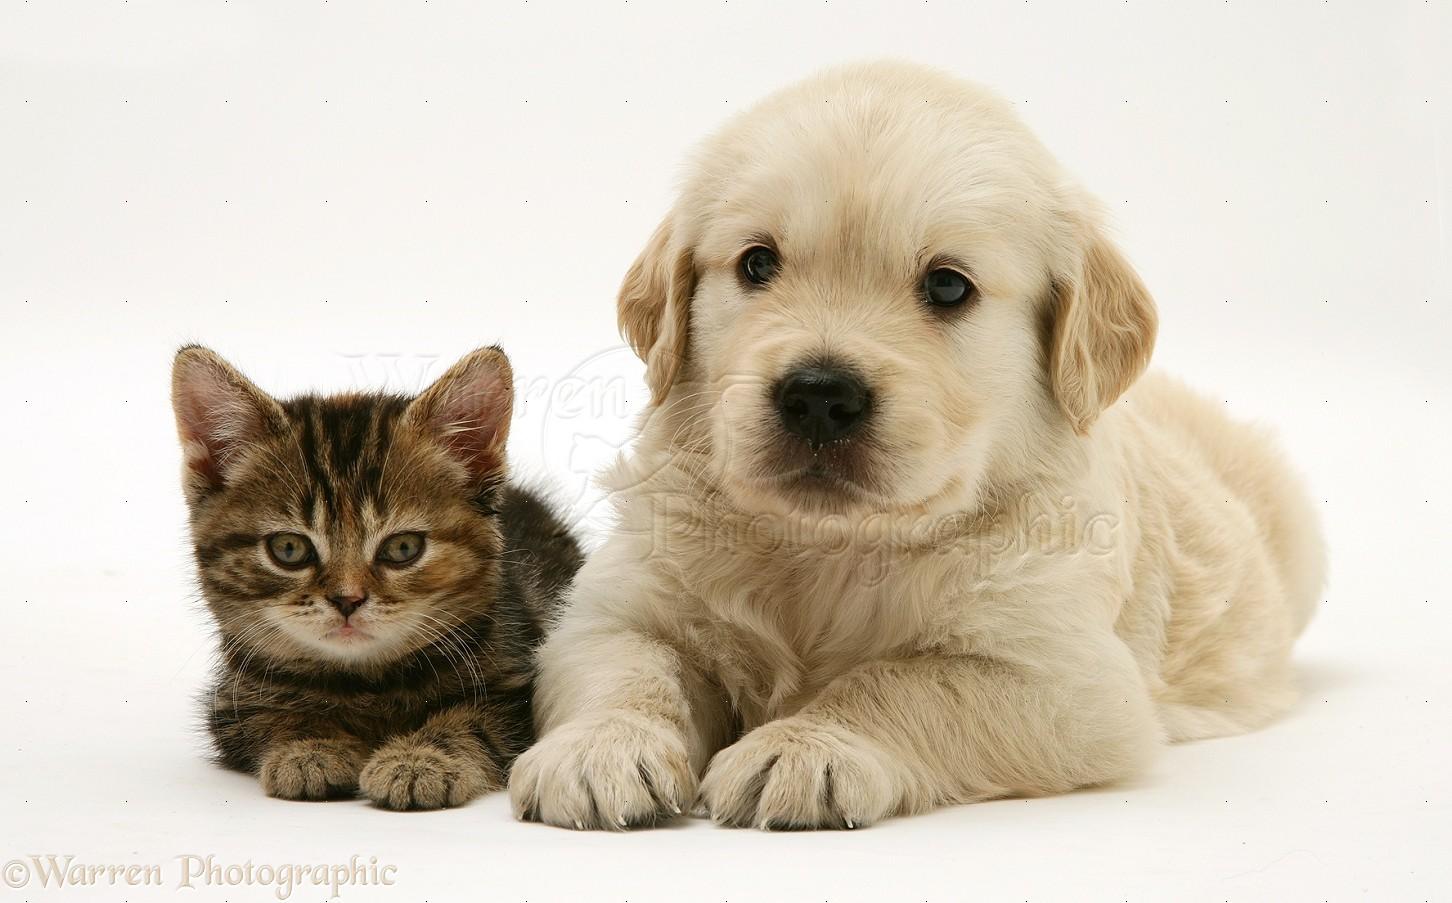 New Puppy With Senior Dog